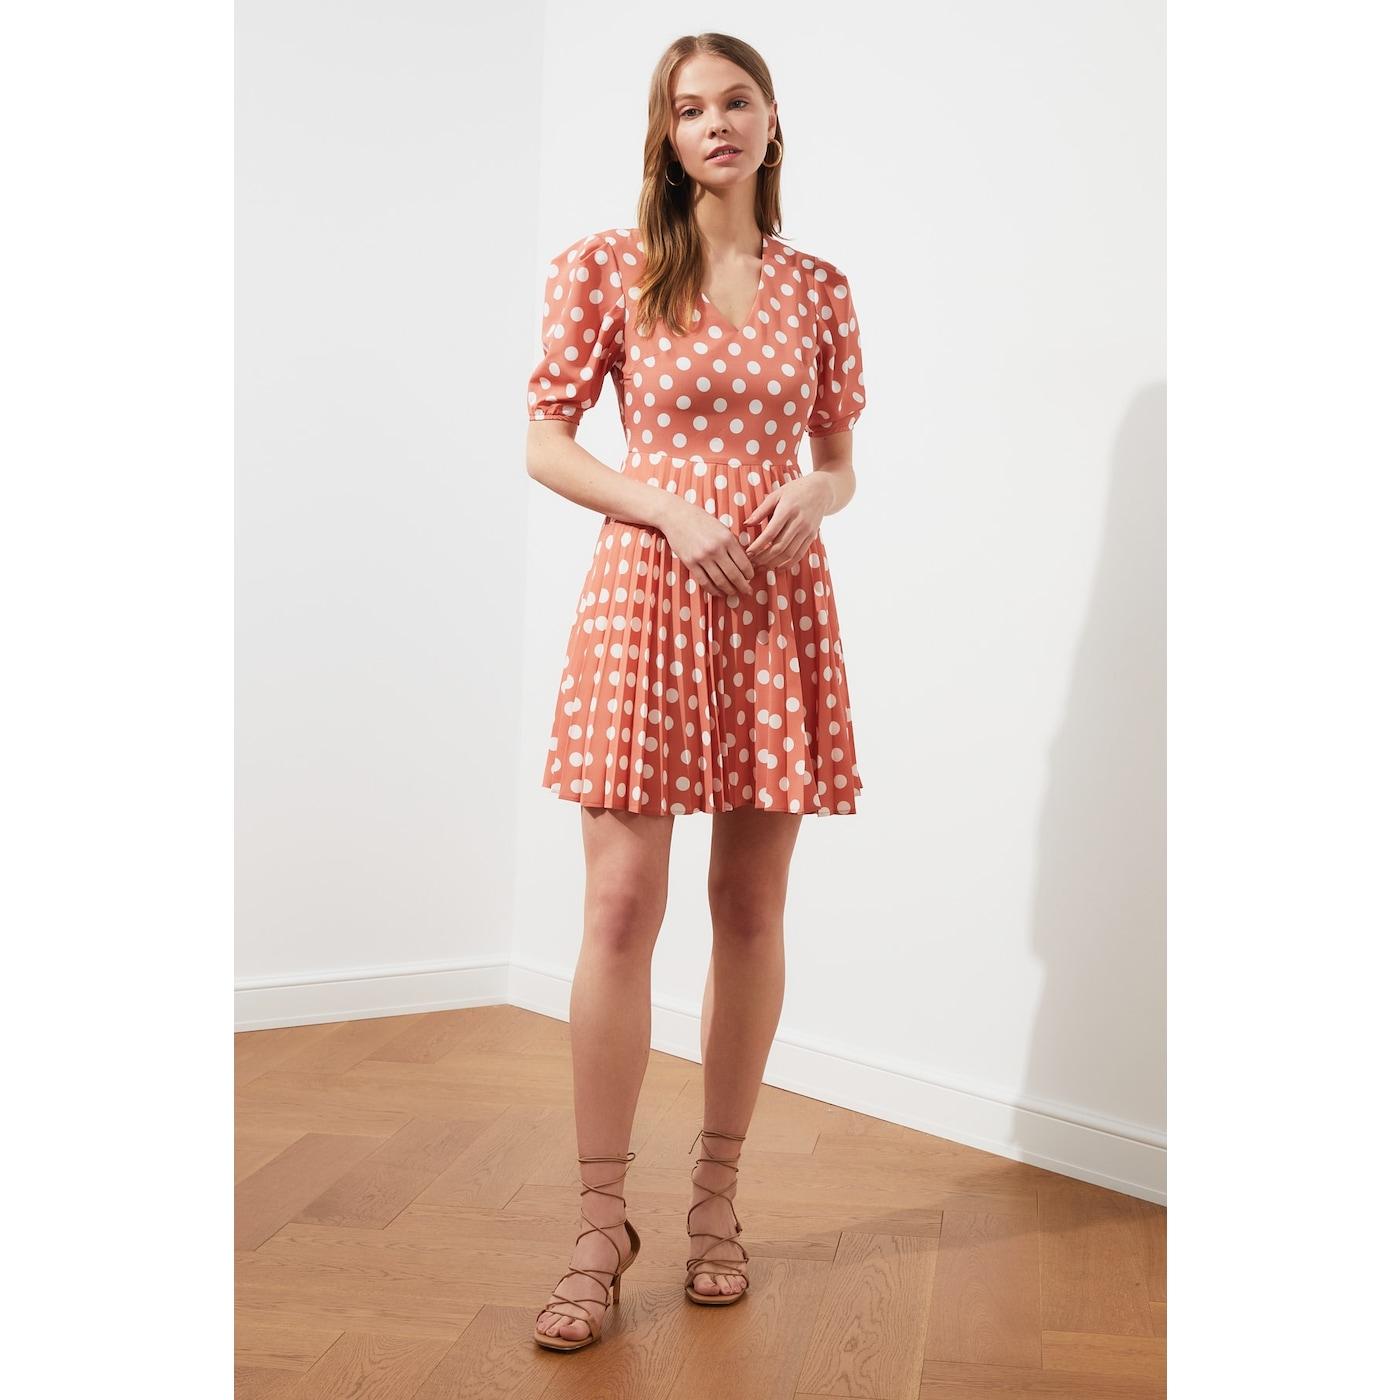 Trendyol Tile Polkalic Pleat Dress dámské 38